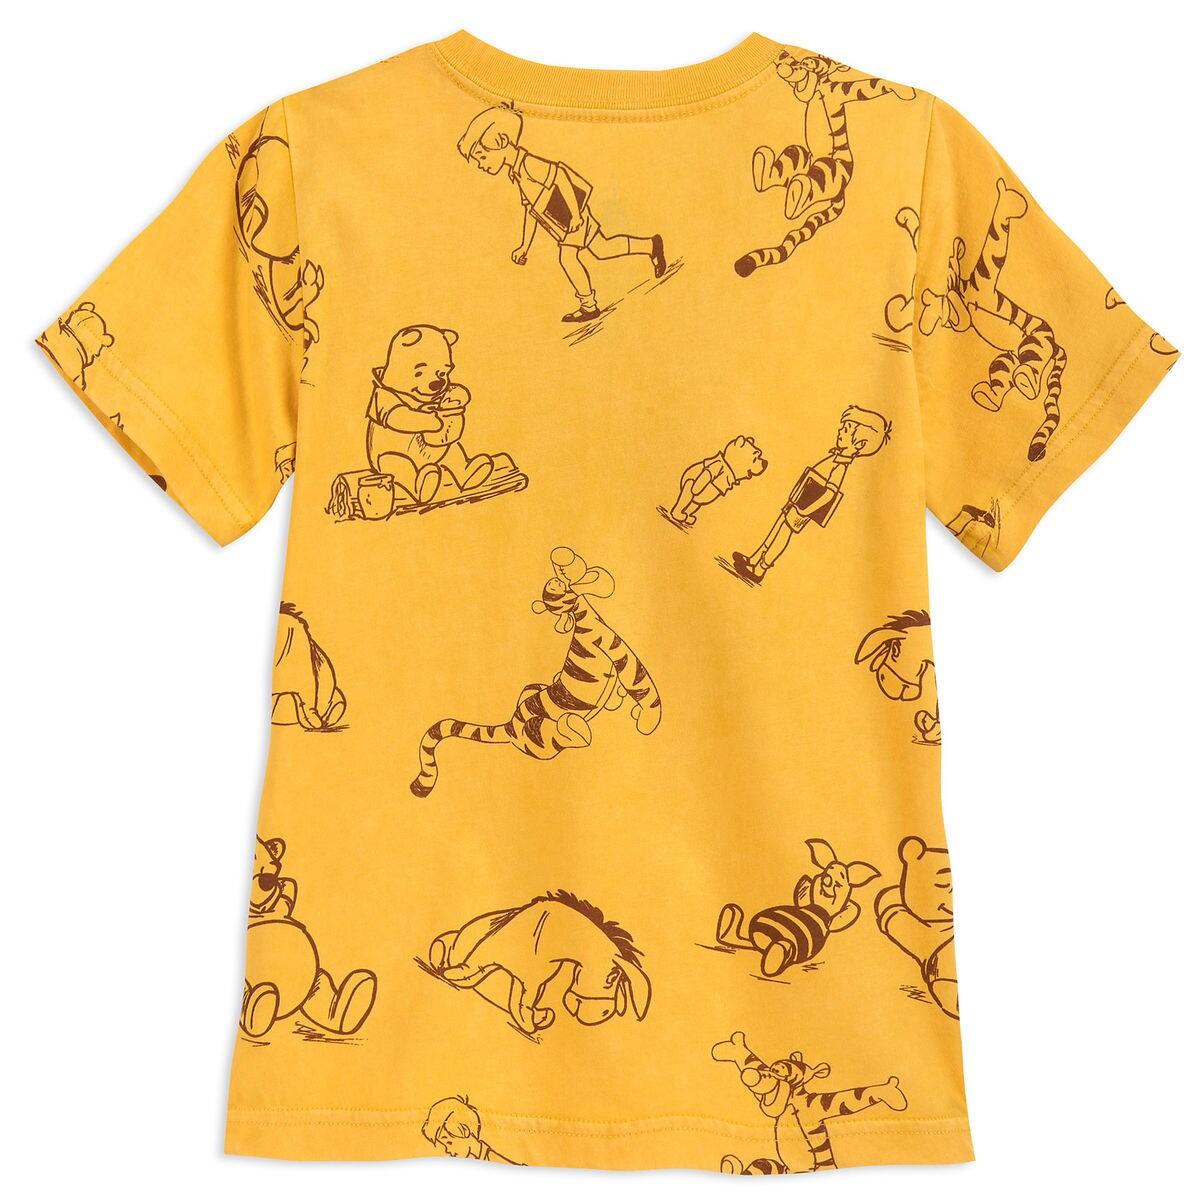 winnie the pooh t shirt for kids shopdisney